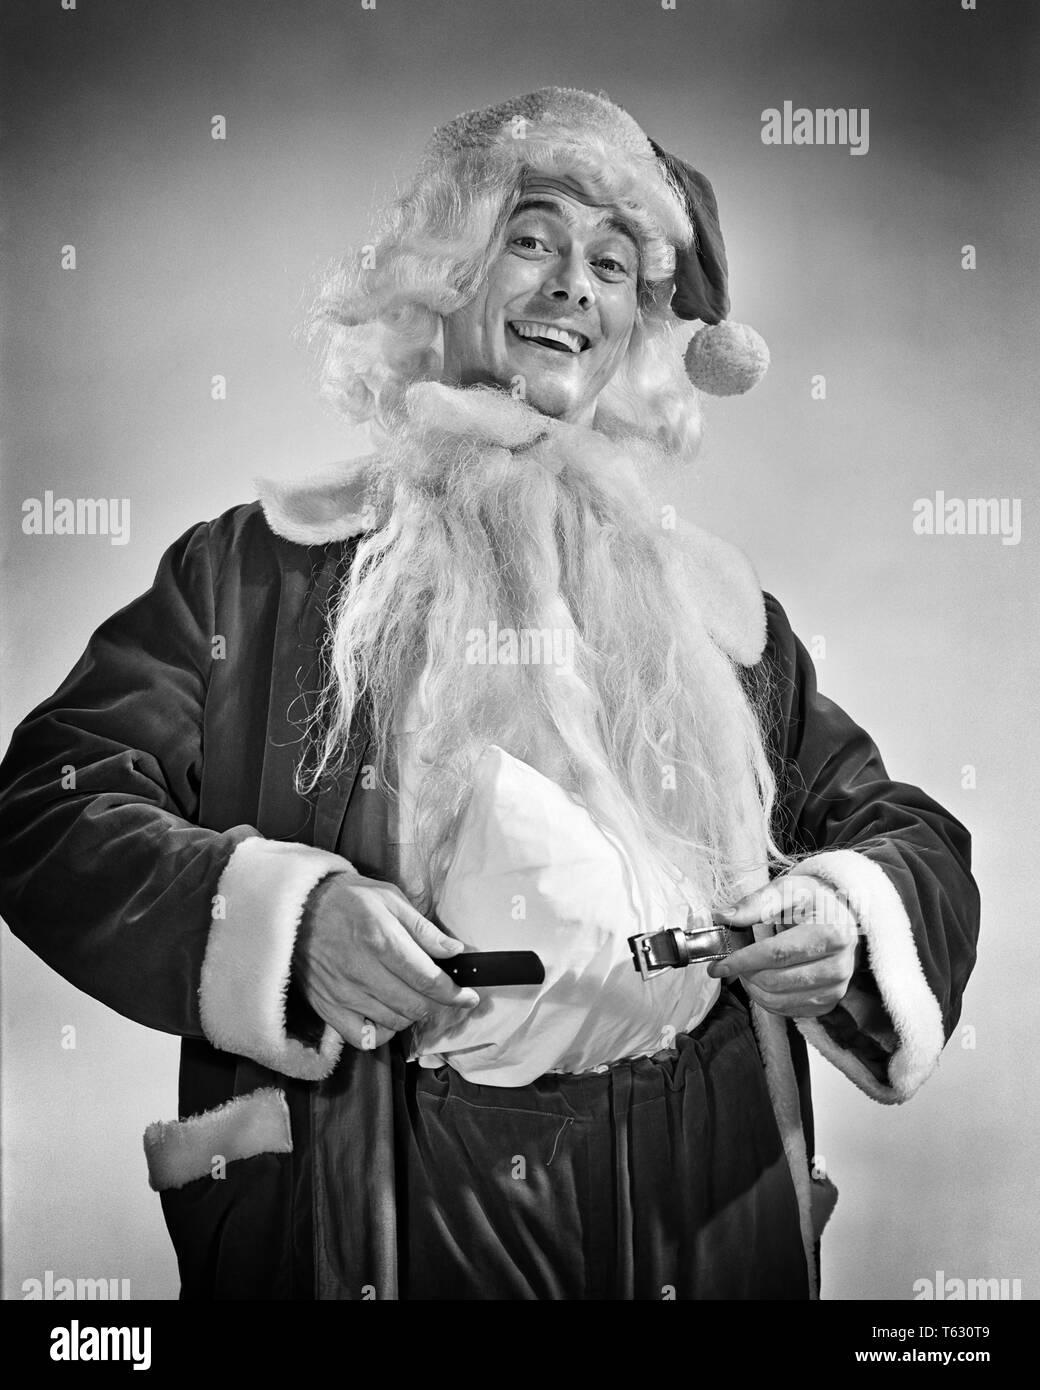 1950s SMILING MAN DRESSING UP IN SANTA COSTUME HOLDING BELT